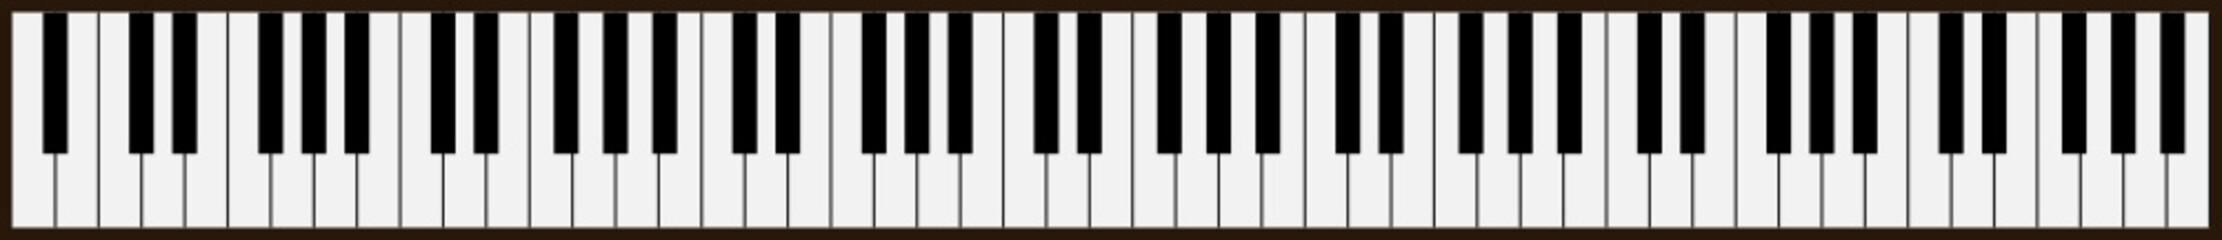 piano keys - vector